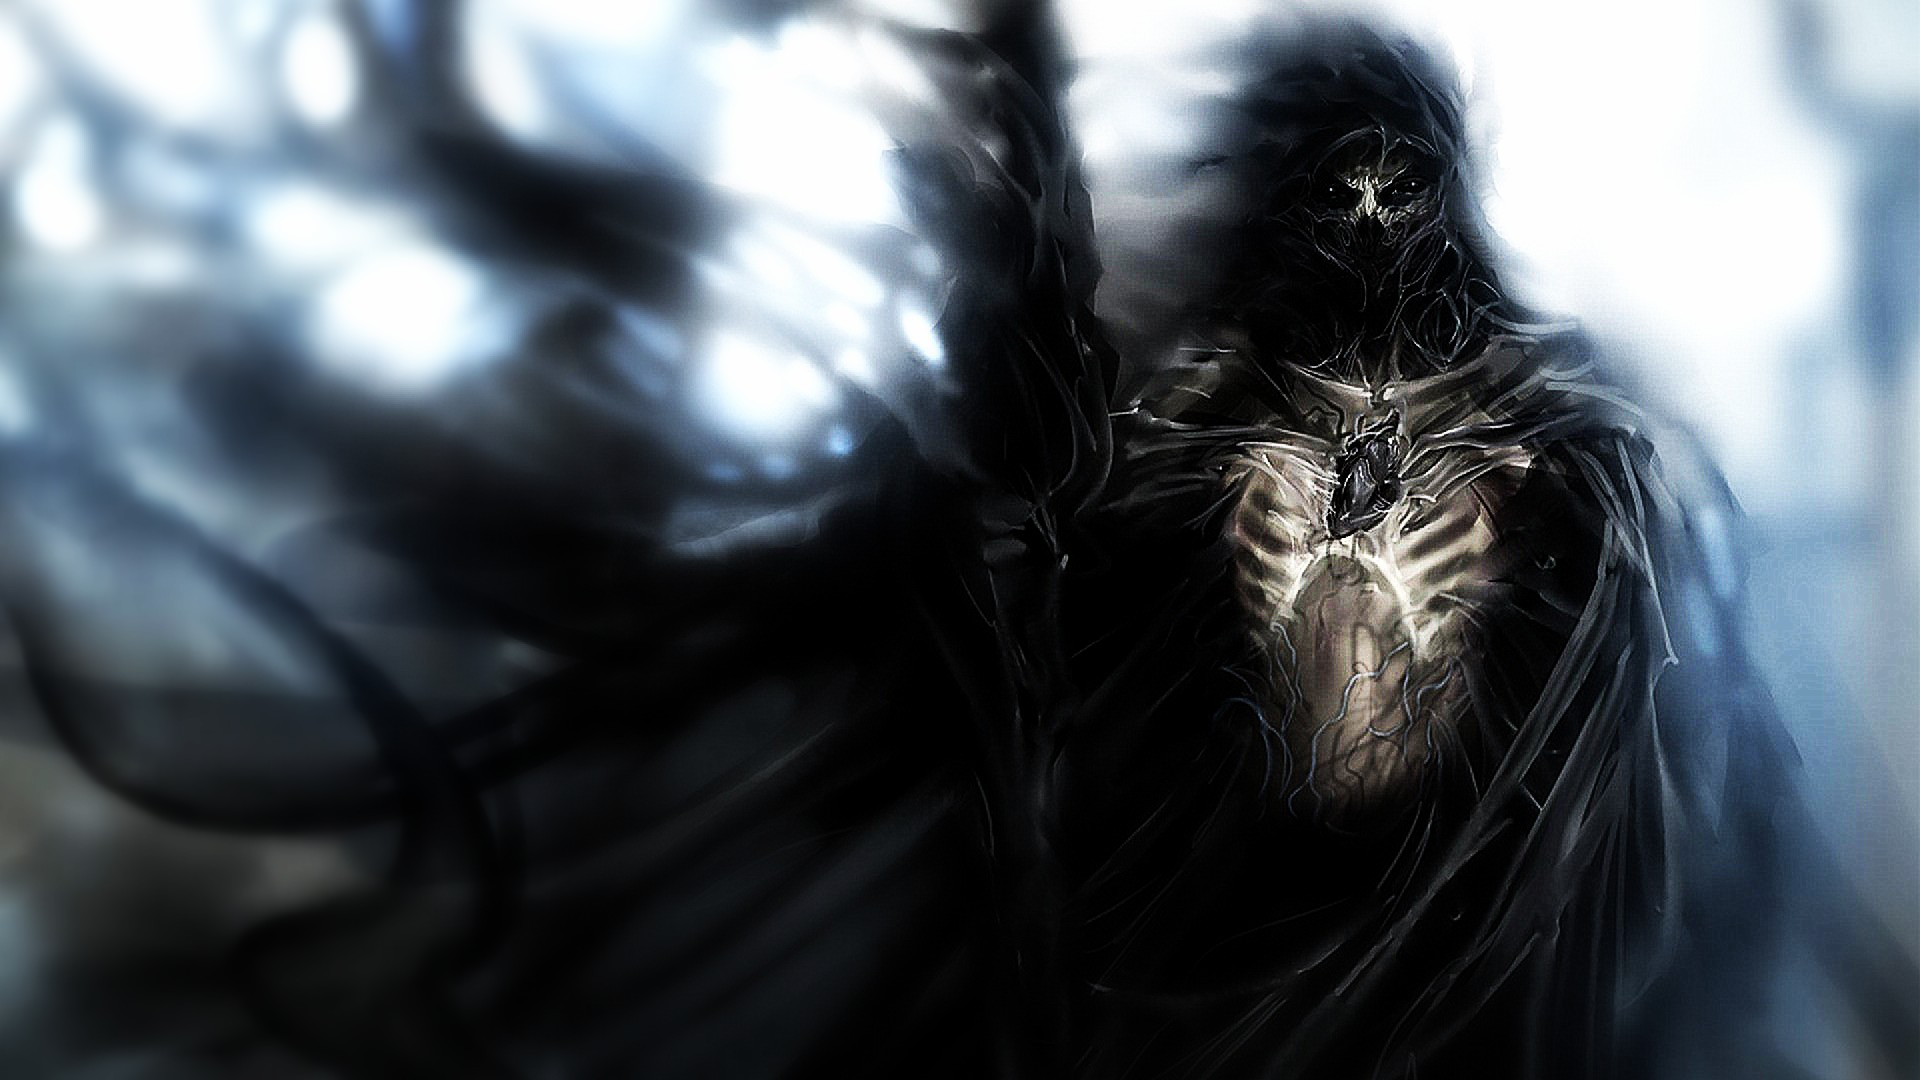 art dark horror evil knight reaper death gothic wallpaper background 1920x1080